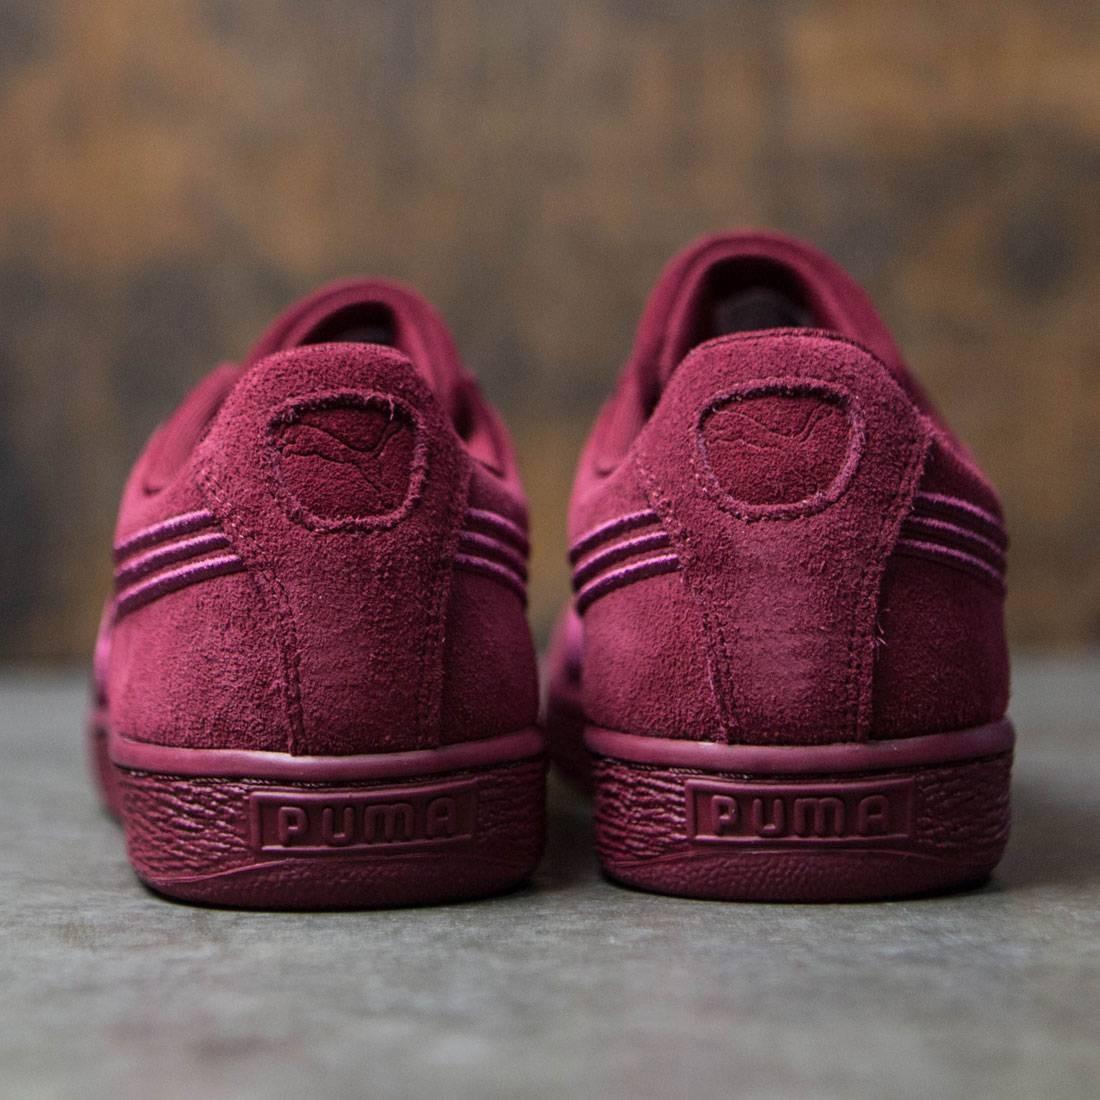 Burgundy SneakersSneakers Classic Suede Puma Classic Puma Puma Suede Burgundy Suede SneakersSneakers nkN8O0wZXP